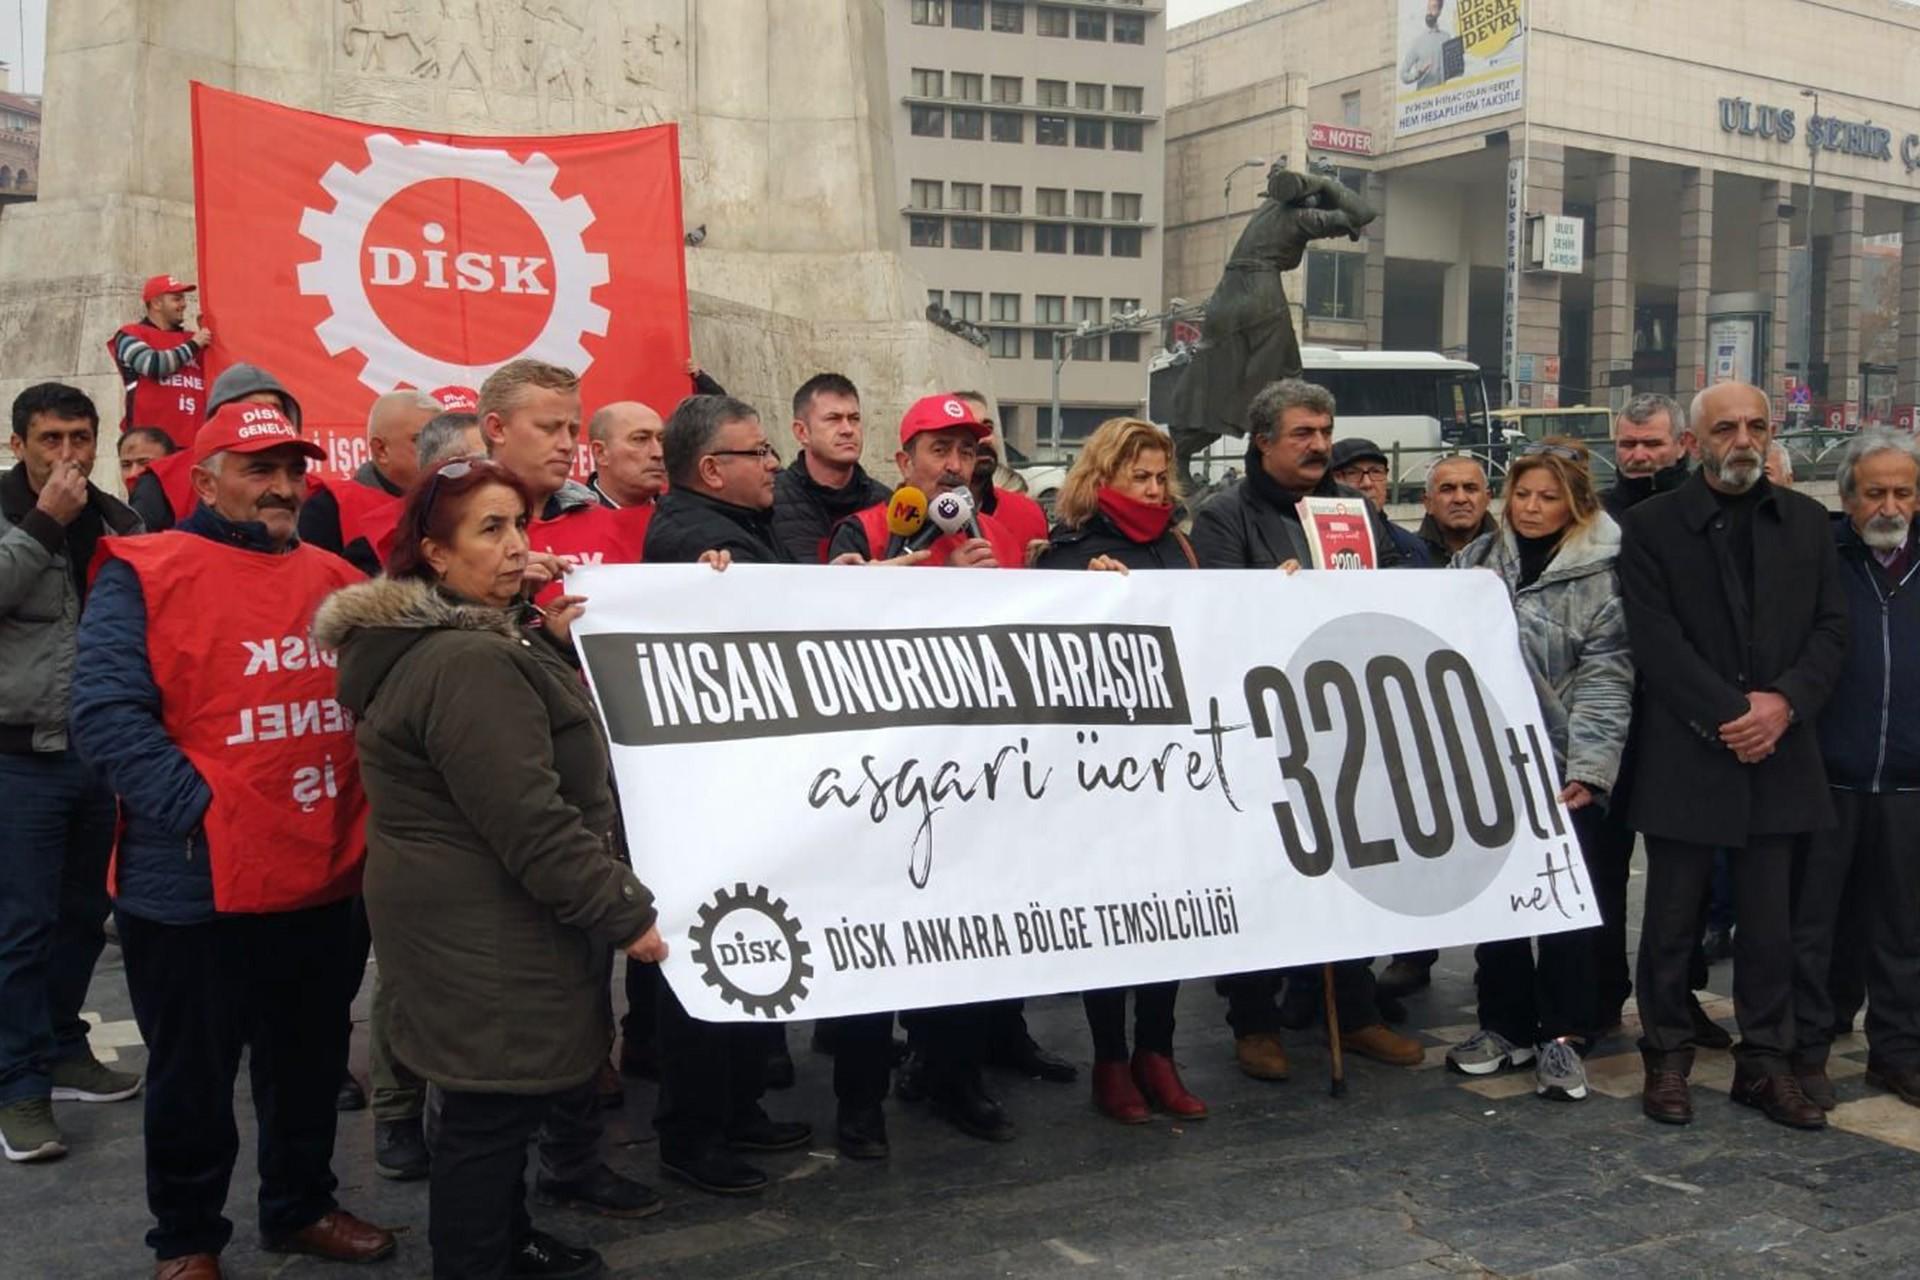 DİSK Ankara Bölge Temsilcilii asgari ücret net 3200 olsun pankartıyla